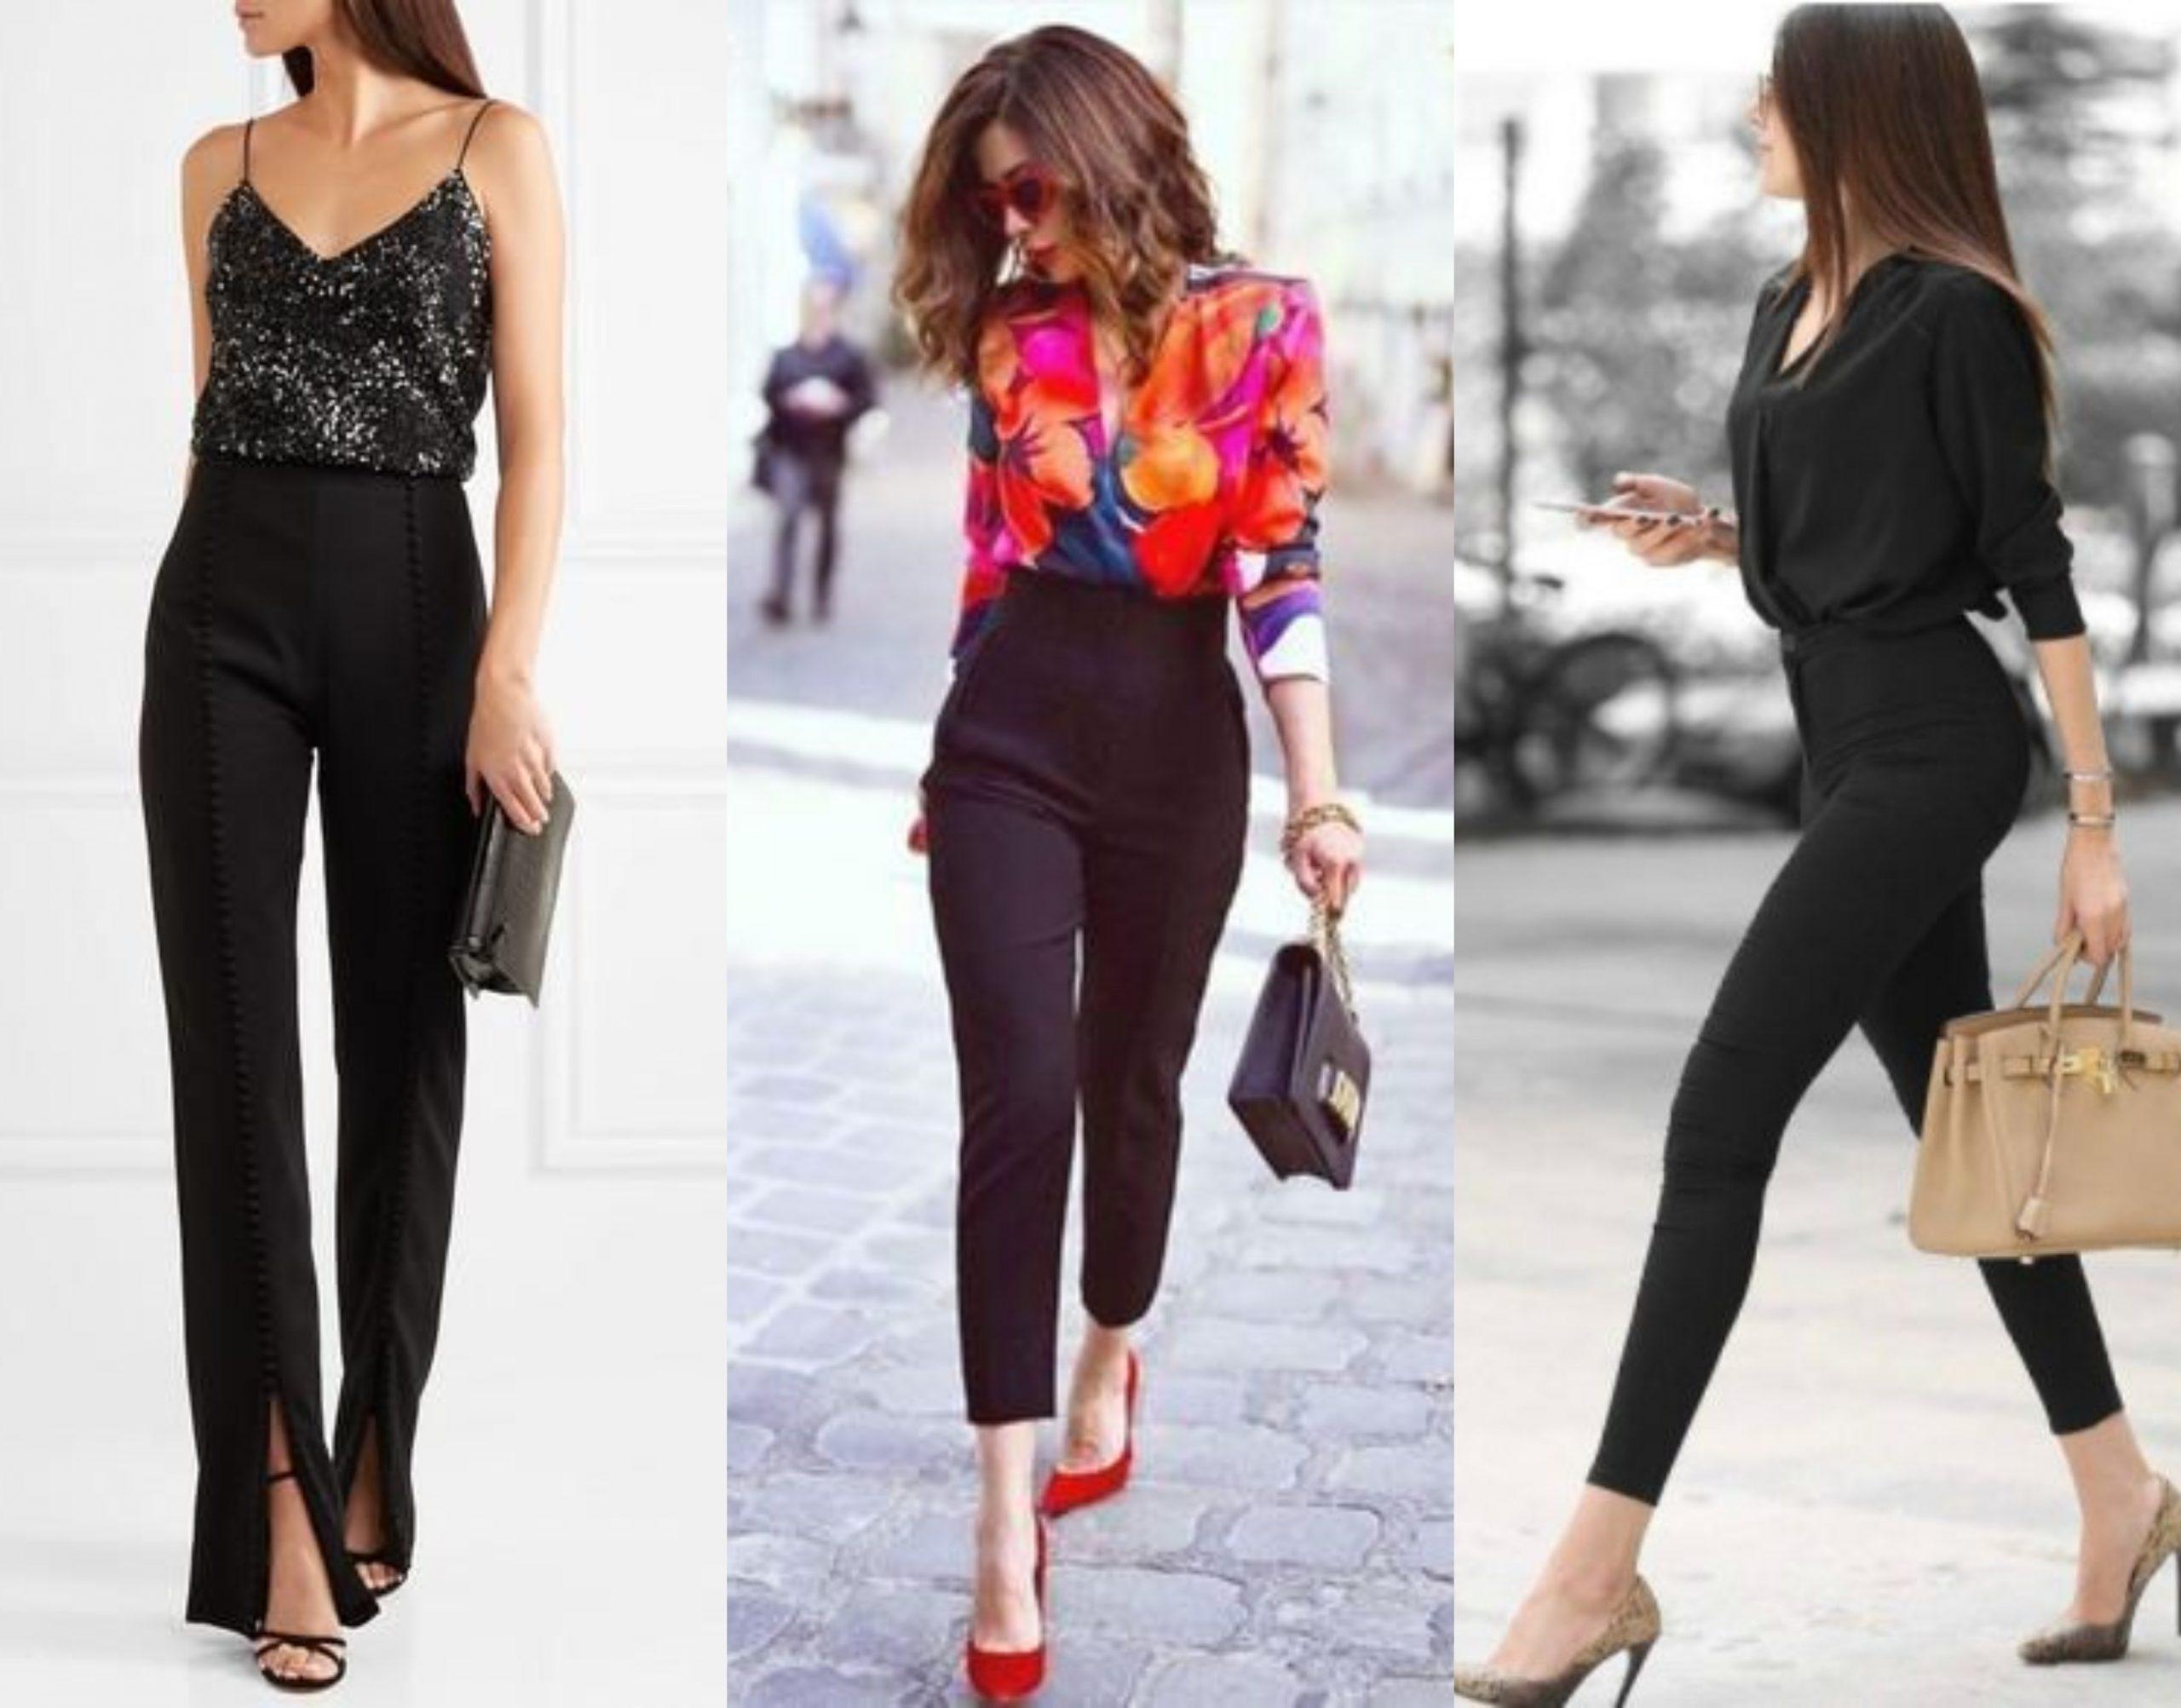 Cinco pantalones negros que estilizan tu figura